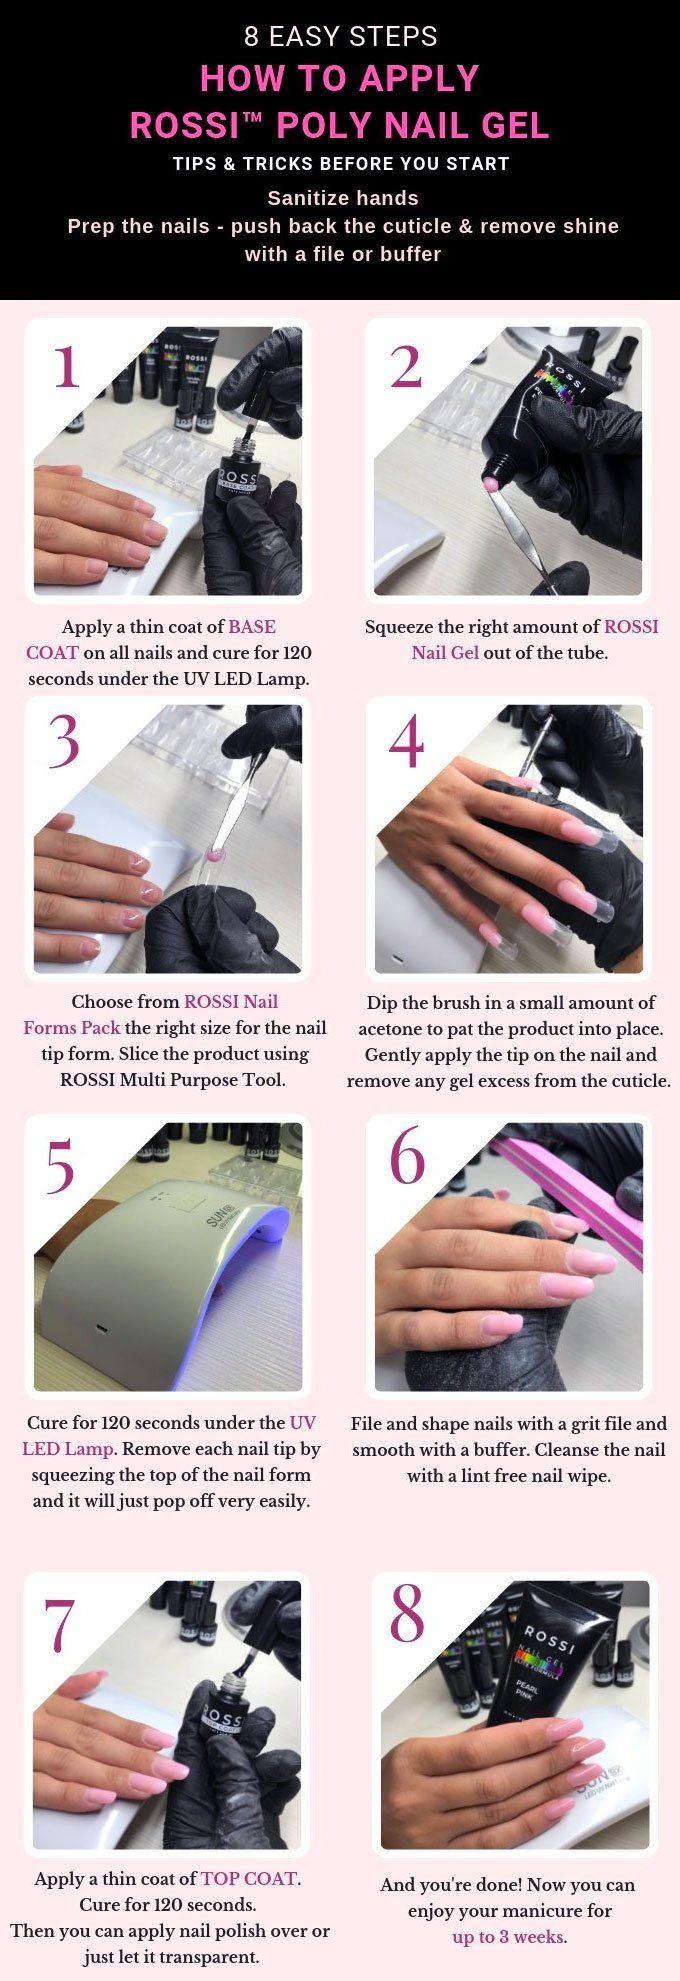 Rossi Nail Gel Kit Gel Nail Tutorial Gel Nail Kit Gel Nails Diy